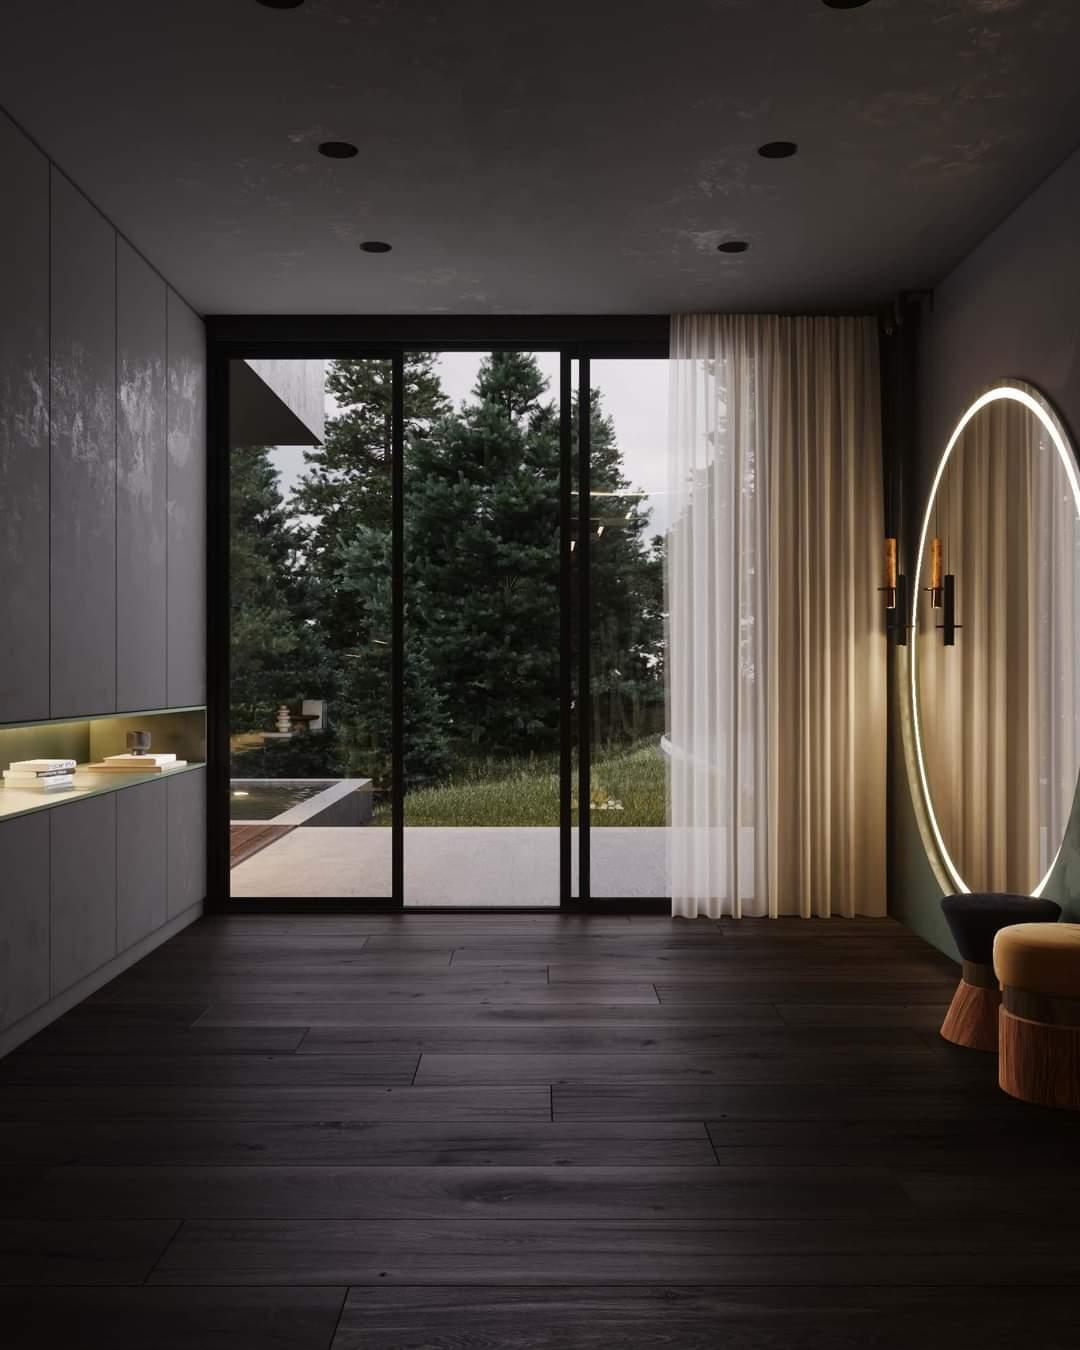 Spacious Living Room With Wooden Floor - Source: Kireevaaanna